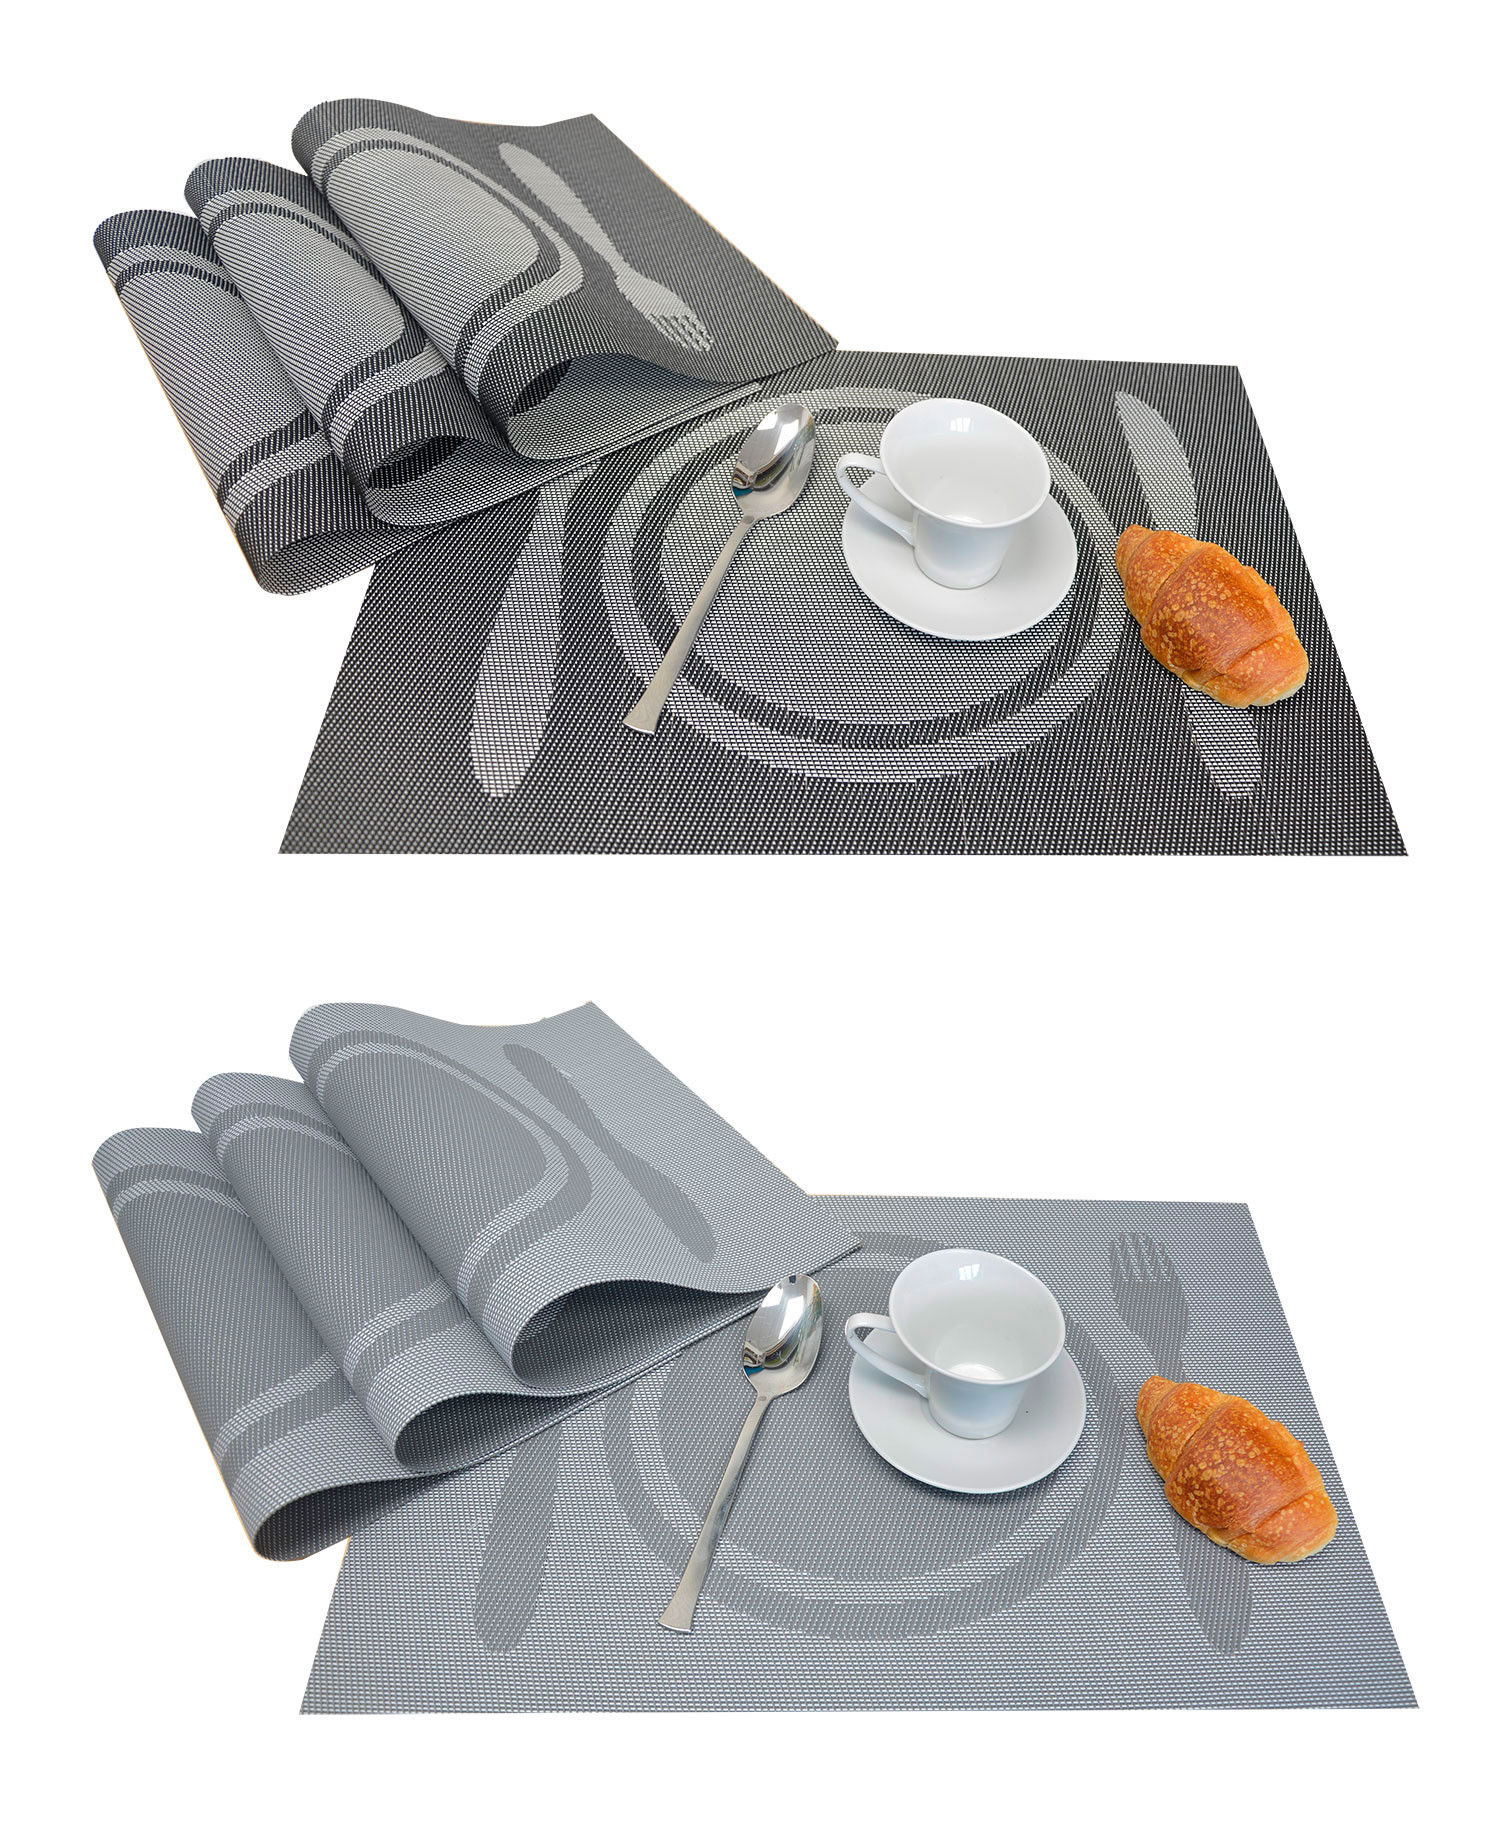 Salvamanteles Individuales Reversibles X4, Lavable y Aislante Salvamantel Gris o Negro  para Comedor 30X45cm